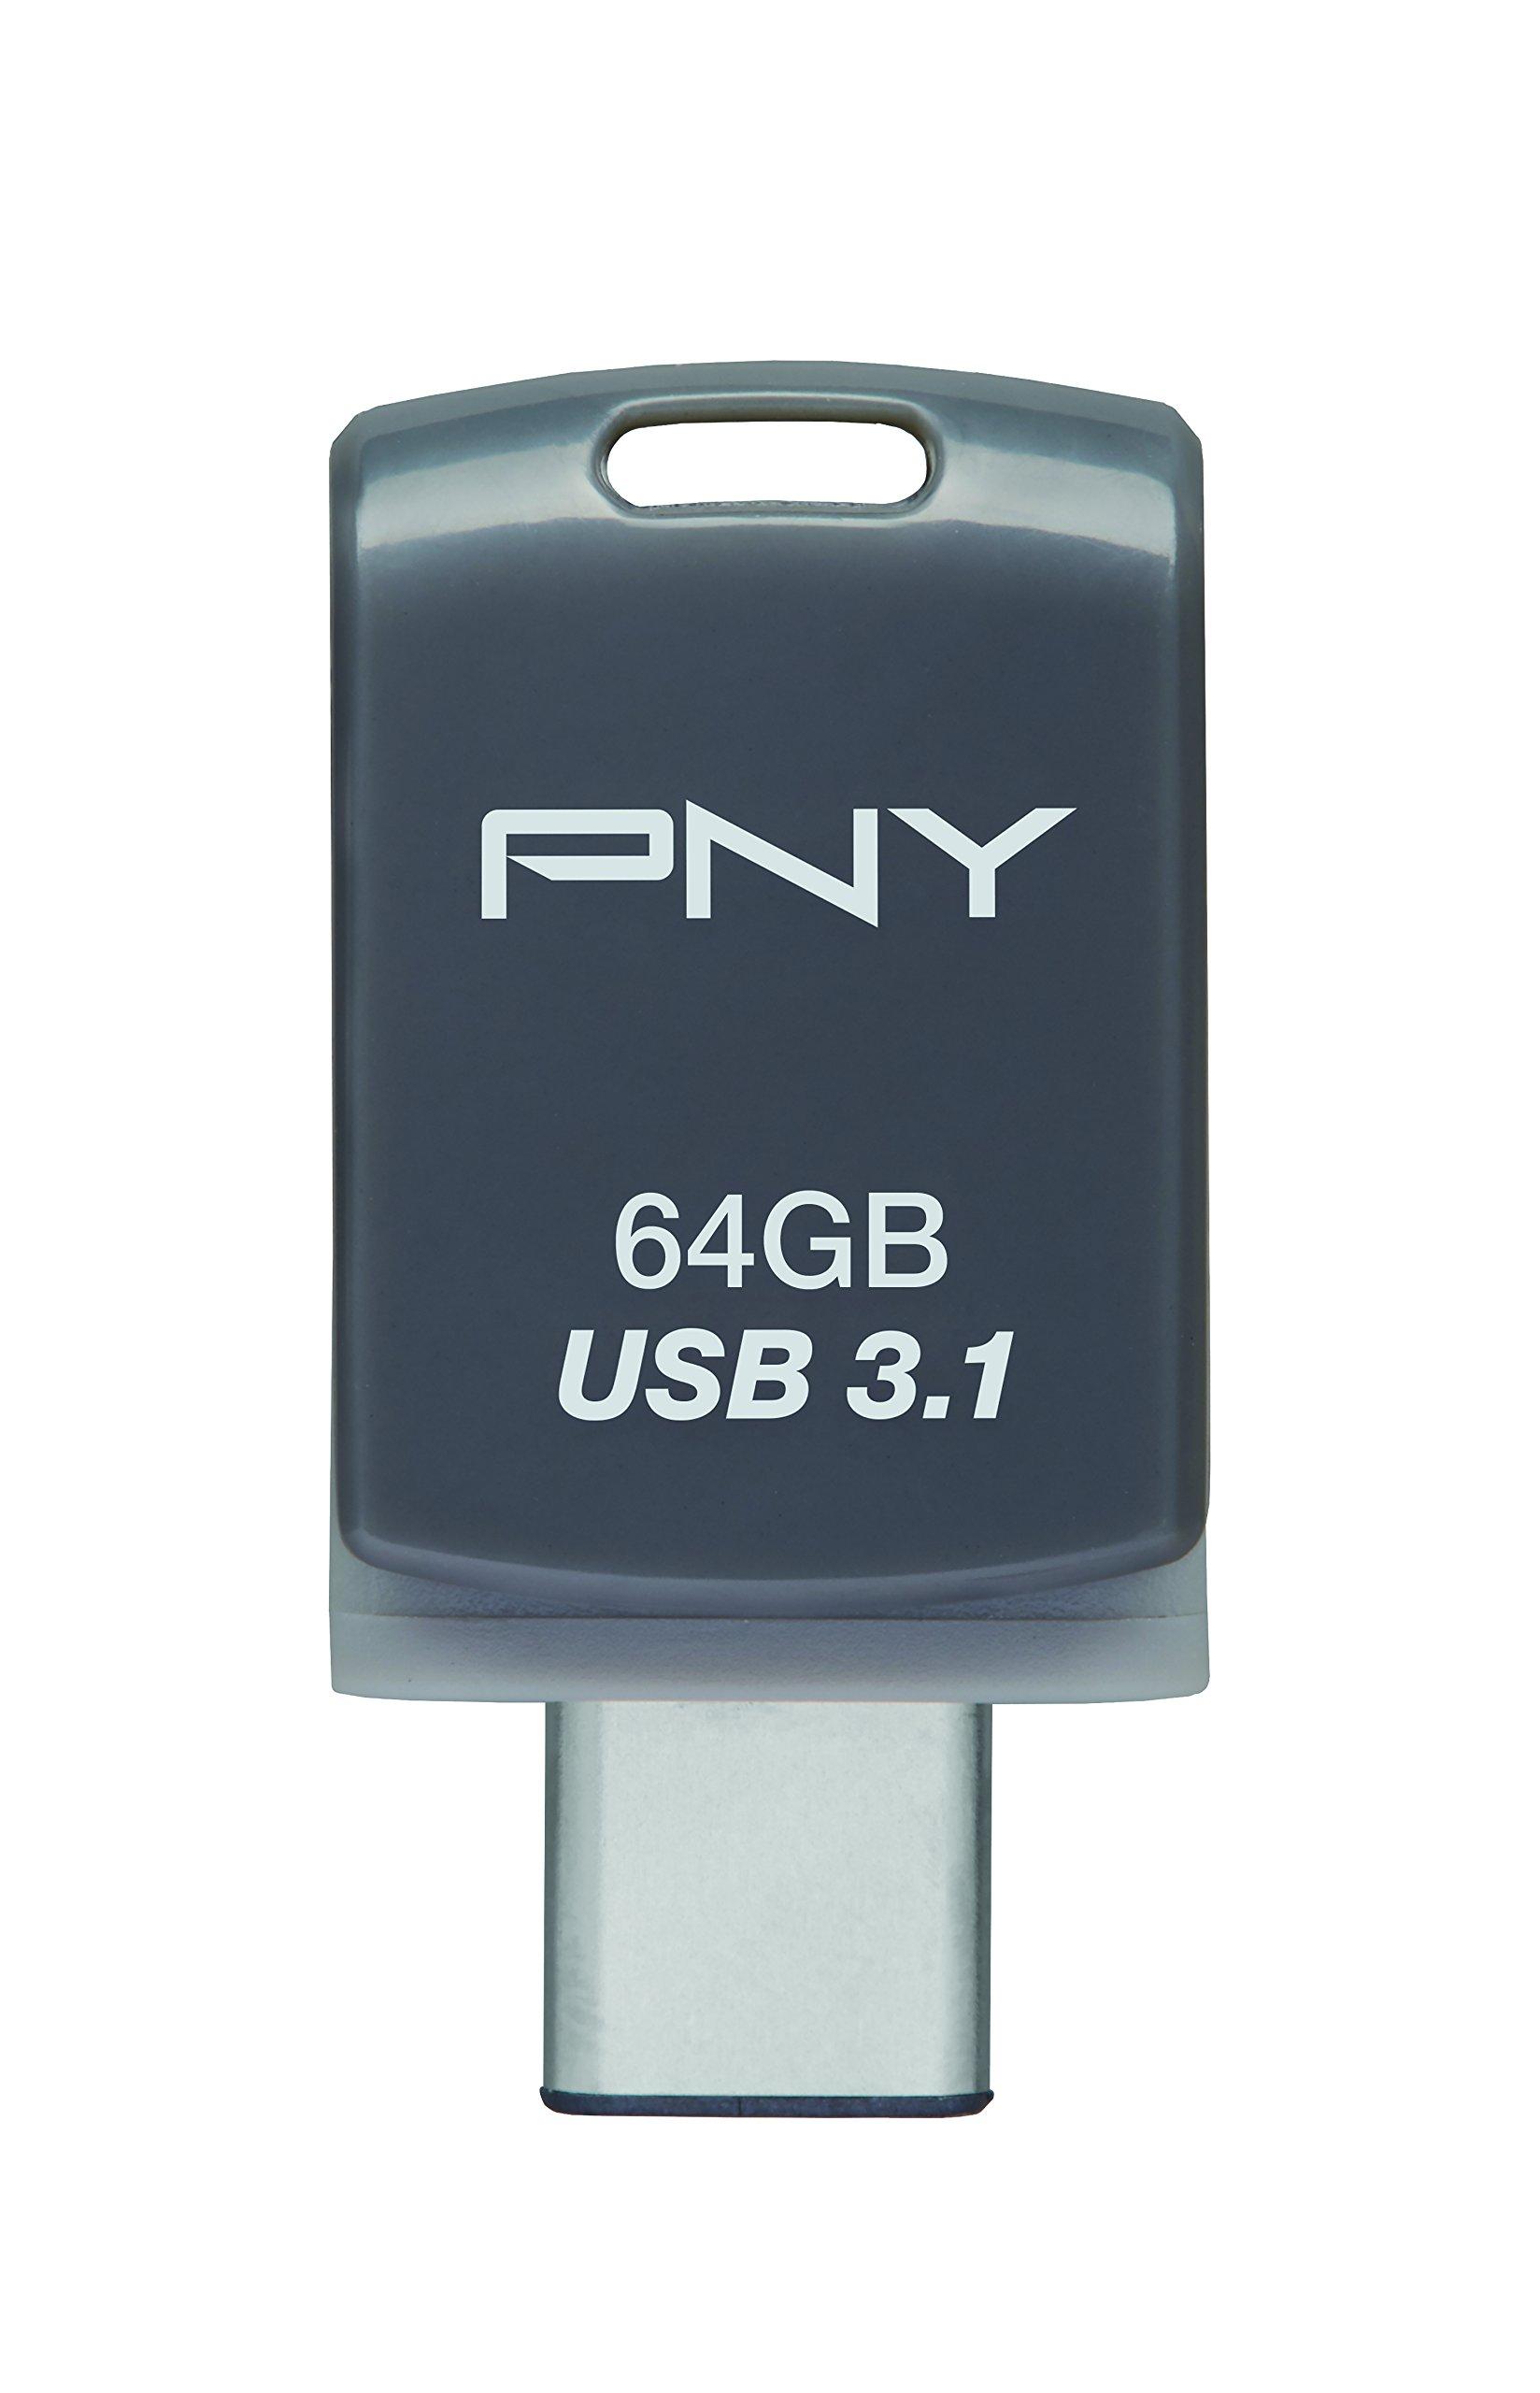 PNY 64GB DUO-LINK Type-C & Type-A Dual OTG USB 3.1 Flash Drive (P-FDU64GOTGCSW31-GE)